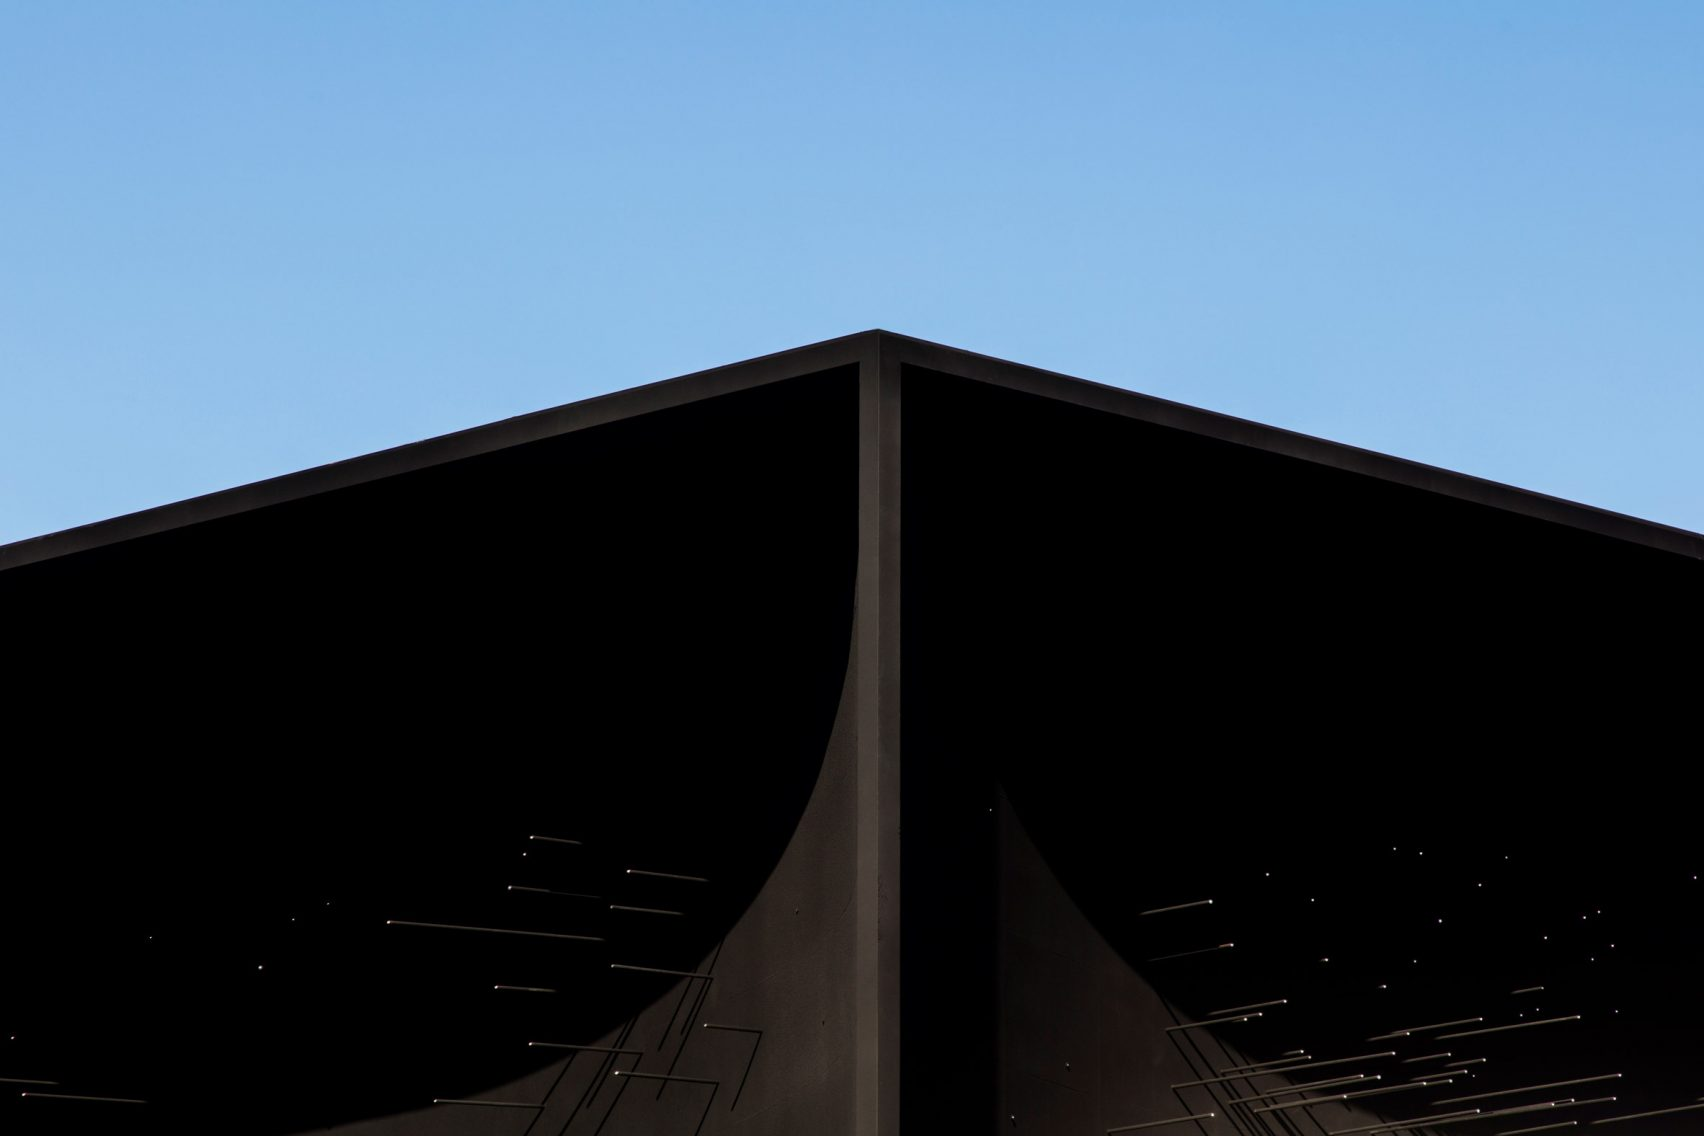 asif-khan-pyeongchang-winter-olympics-south-korea-architecture_dezeen_2364_col_4-1704x1136.jpg